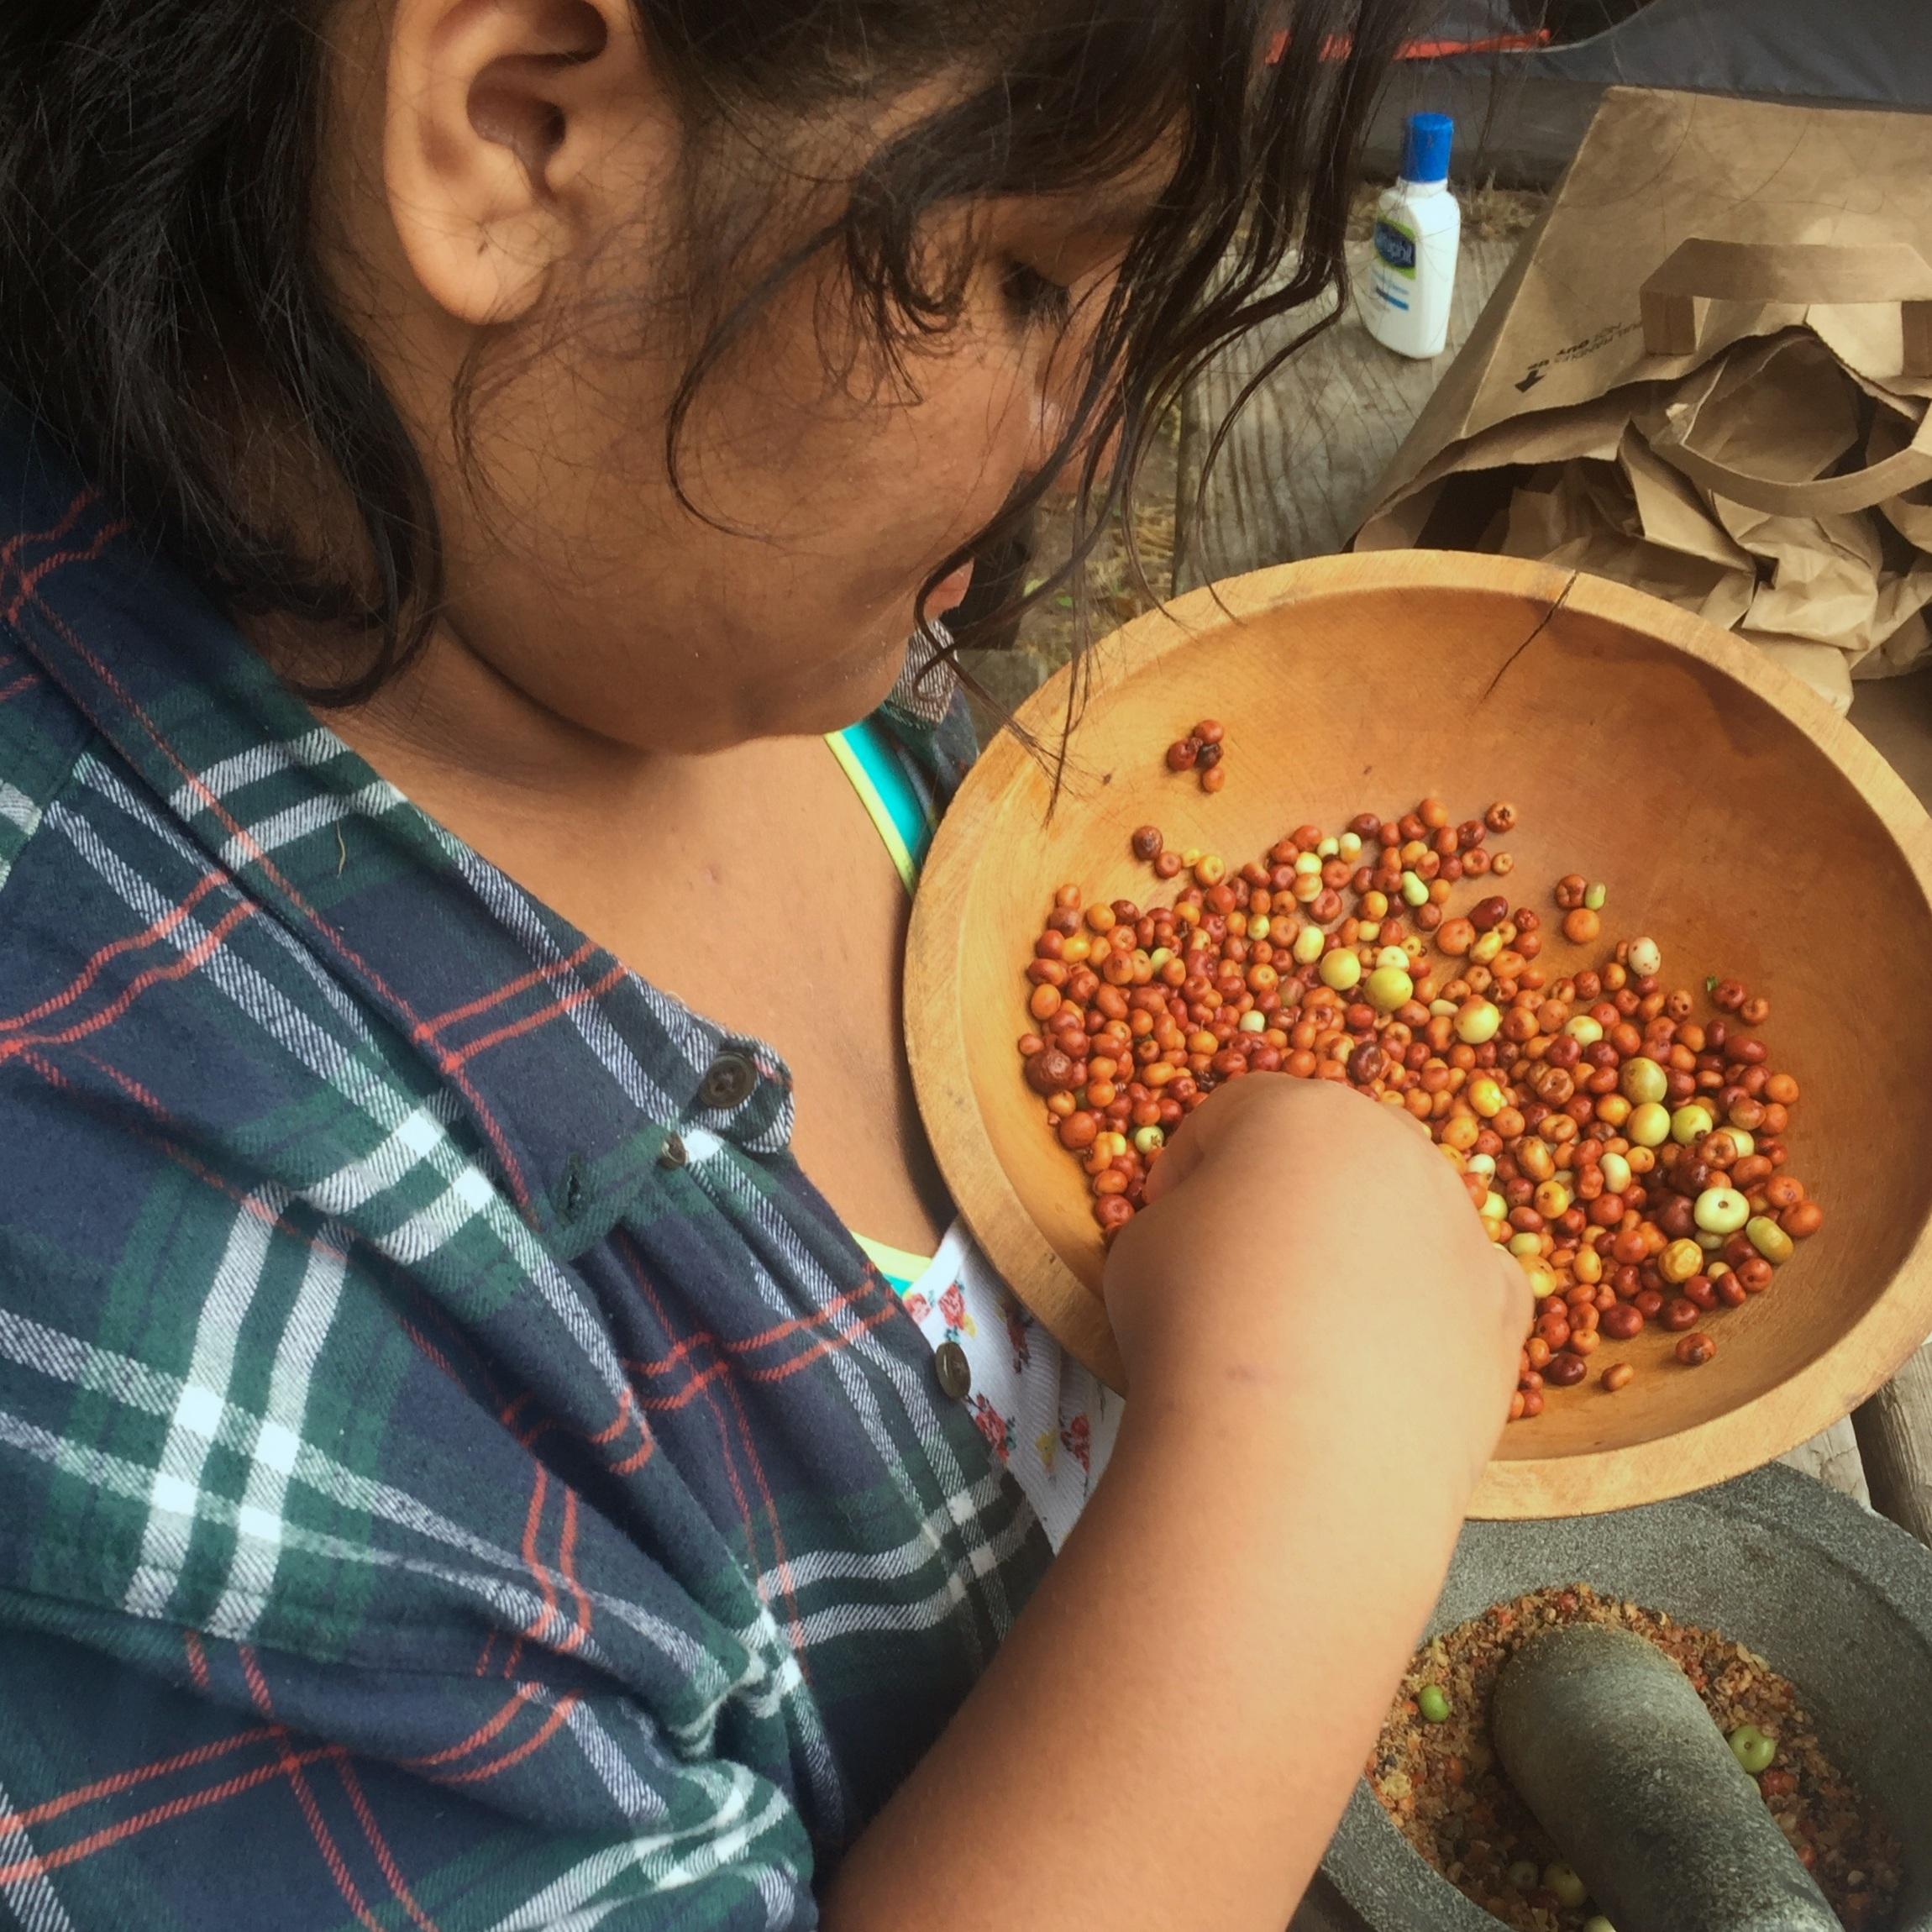 Author, Laylah Luna-Carrisosa processing manzanita berries to make manzanita cider